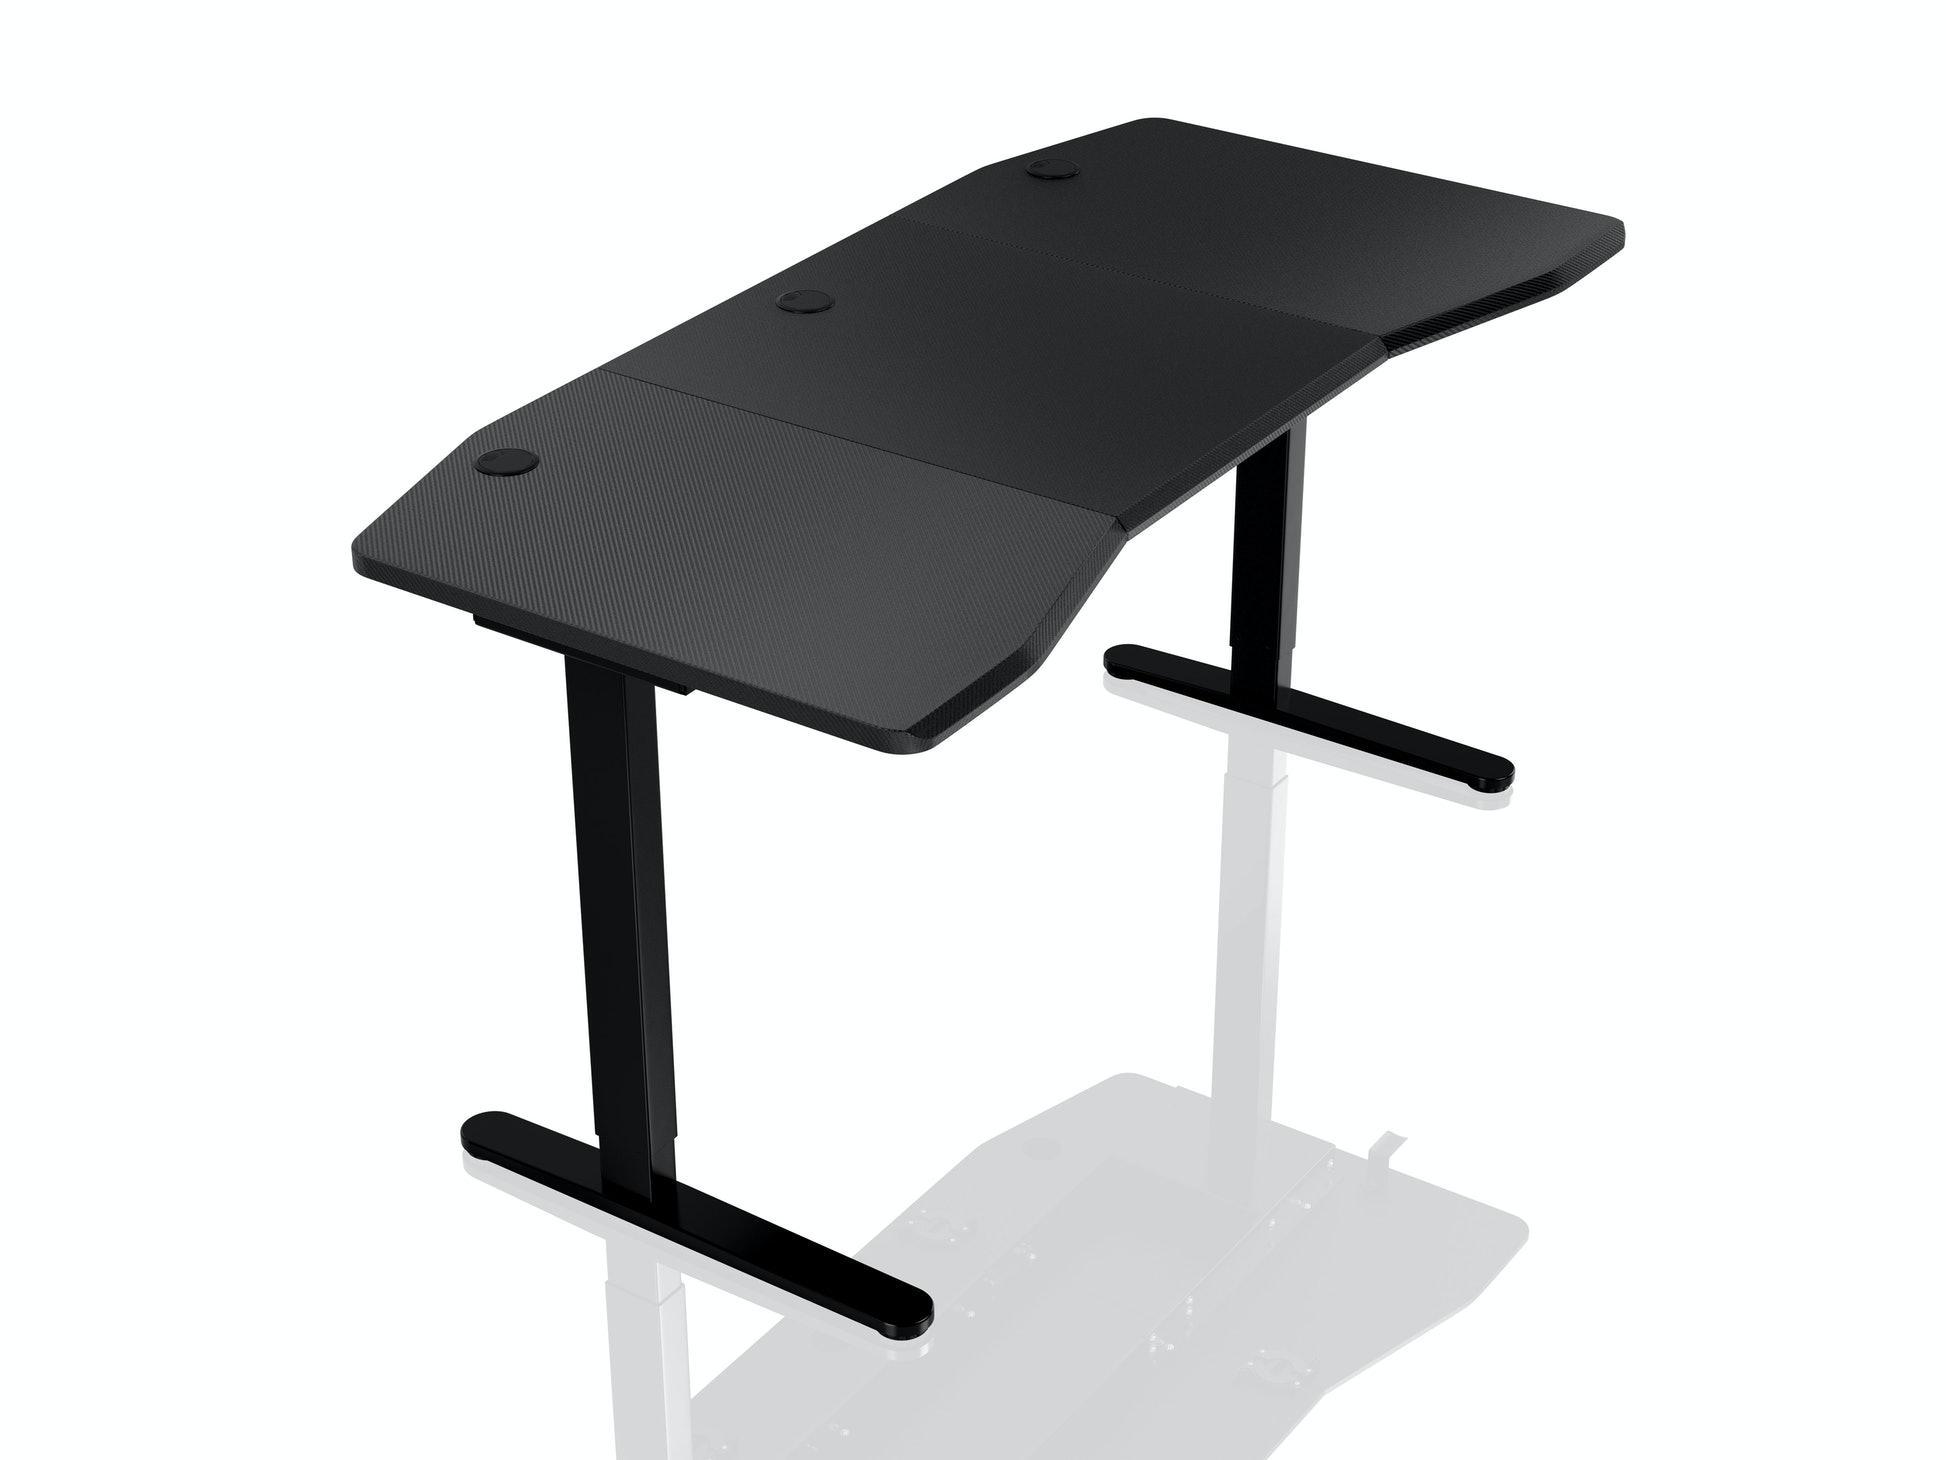 Геймърско бюро Nitro Concepts D16M, Carbon Black-3